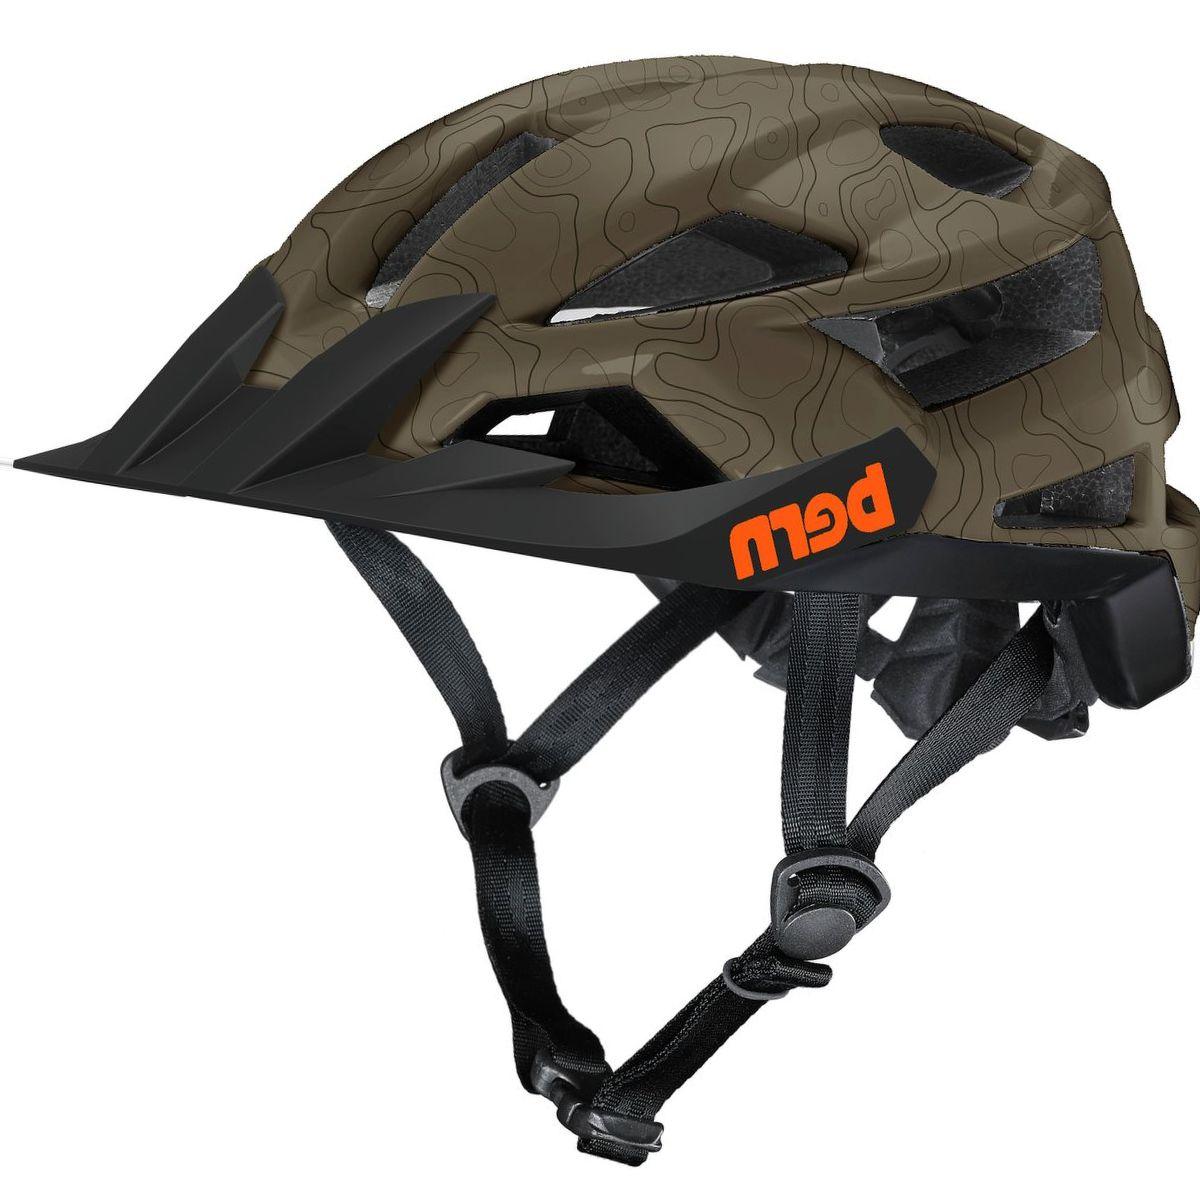 Bern FL-1 XC Mountain Bike Helmet - Women's